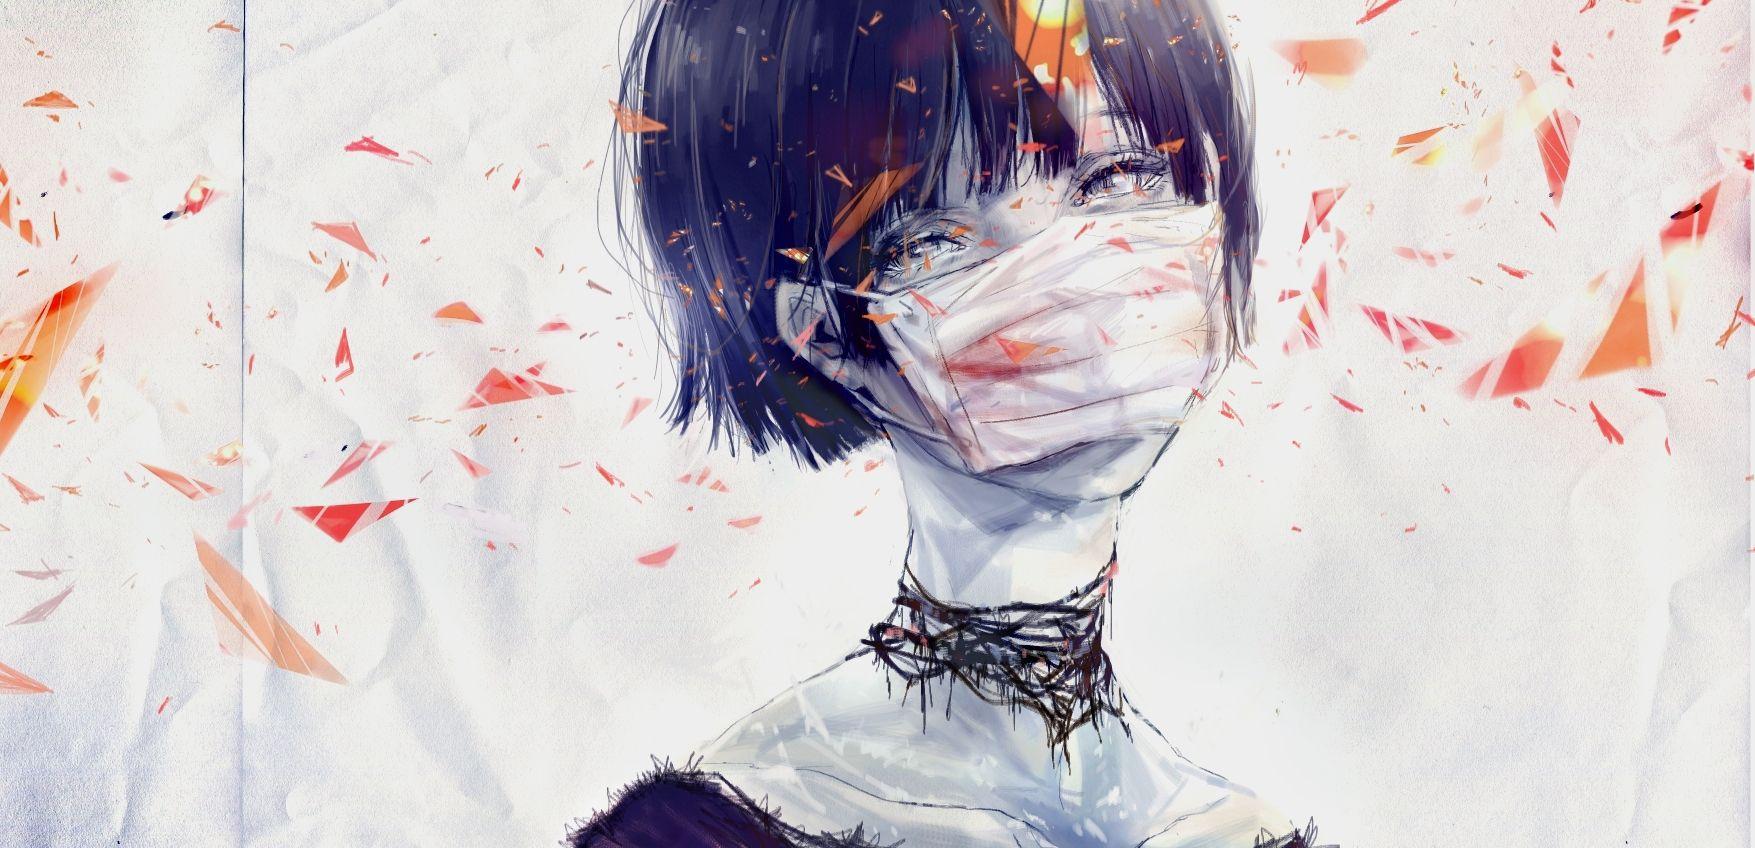 Medical Mask Girl Anime Anime Images Art